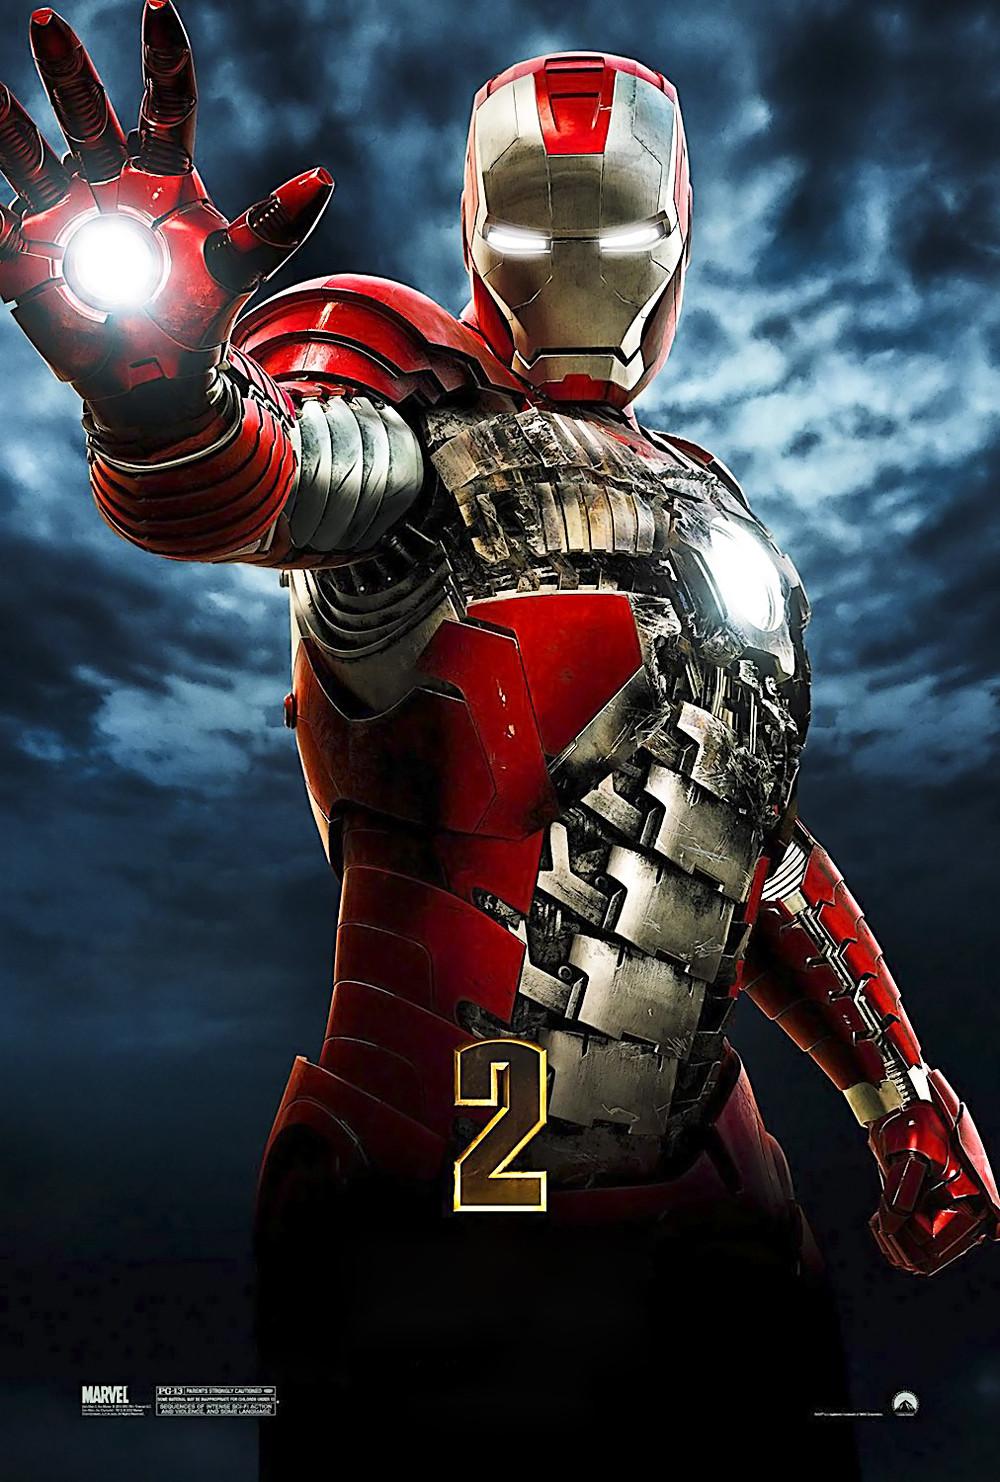 Iron Man - 2 (2010) | (mpdb)